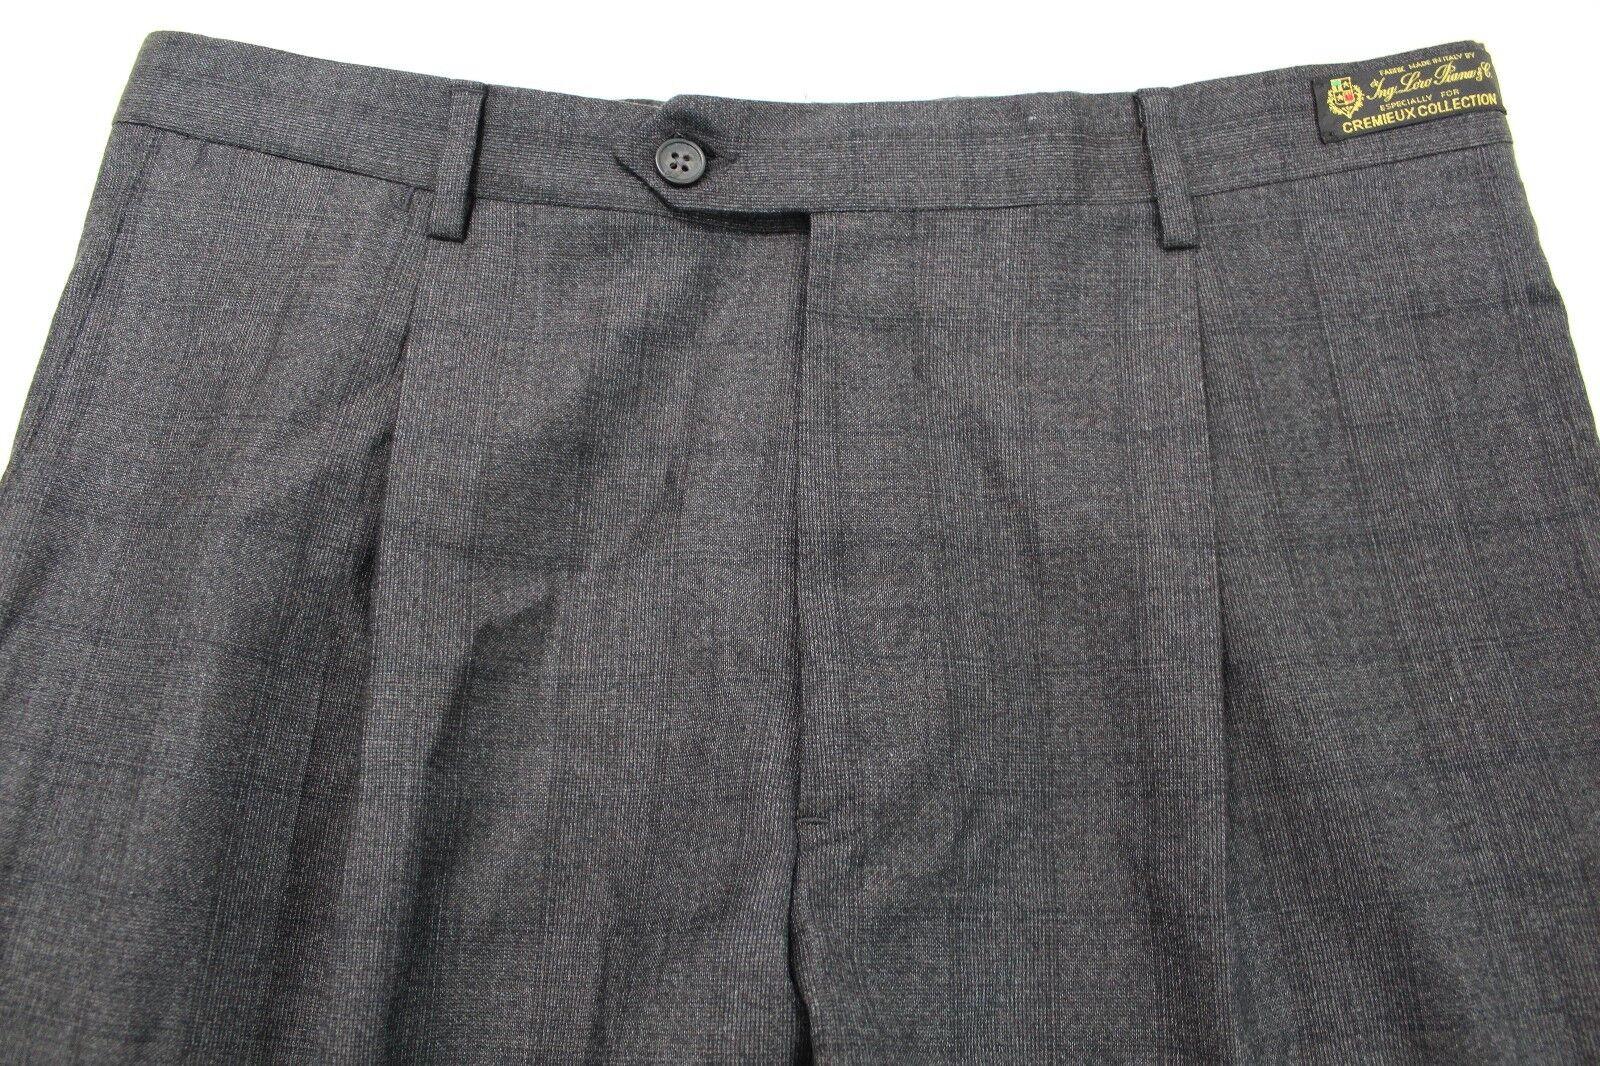 Men's DANIEL CREMIEUX Lgold PIANA Sz 35 Brown Pleat Wool Dress Pants